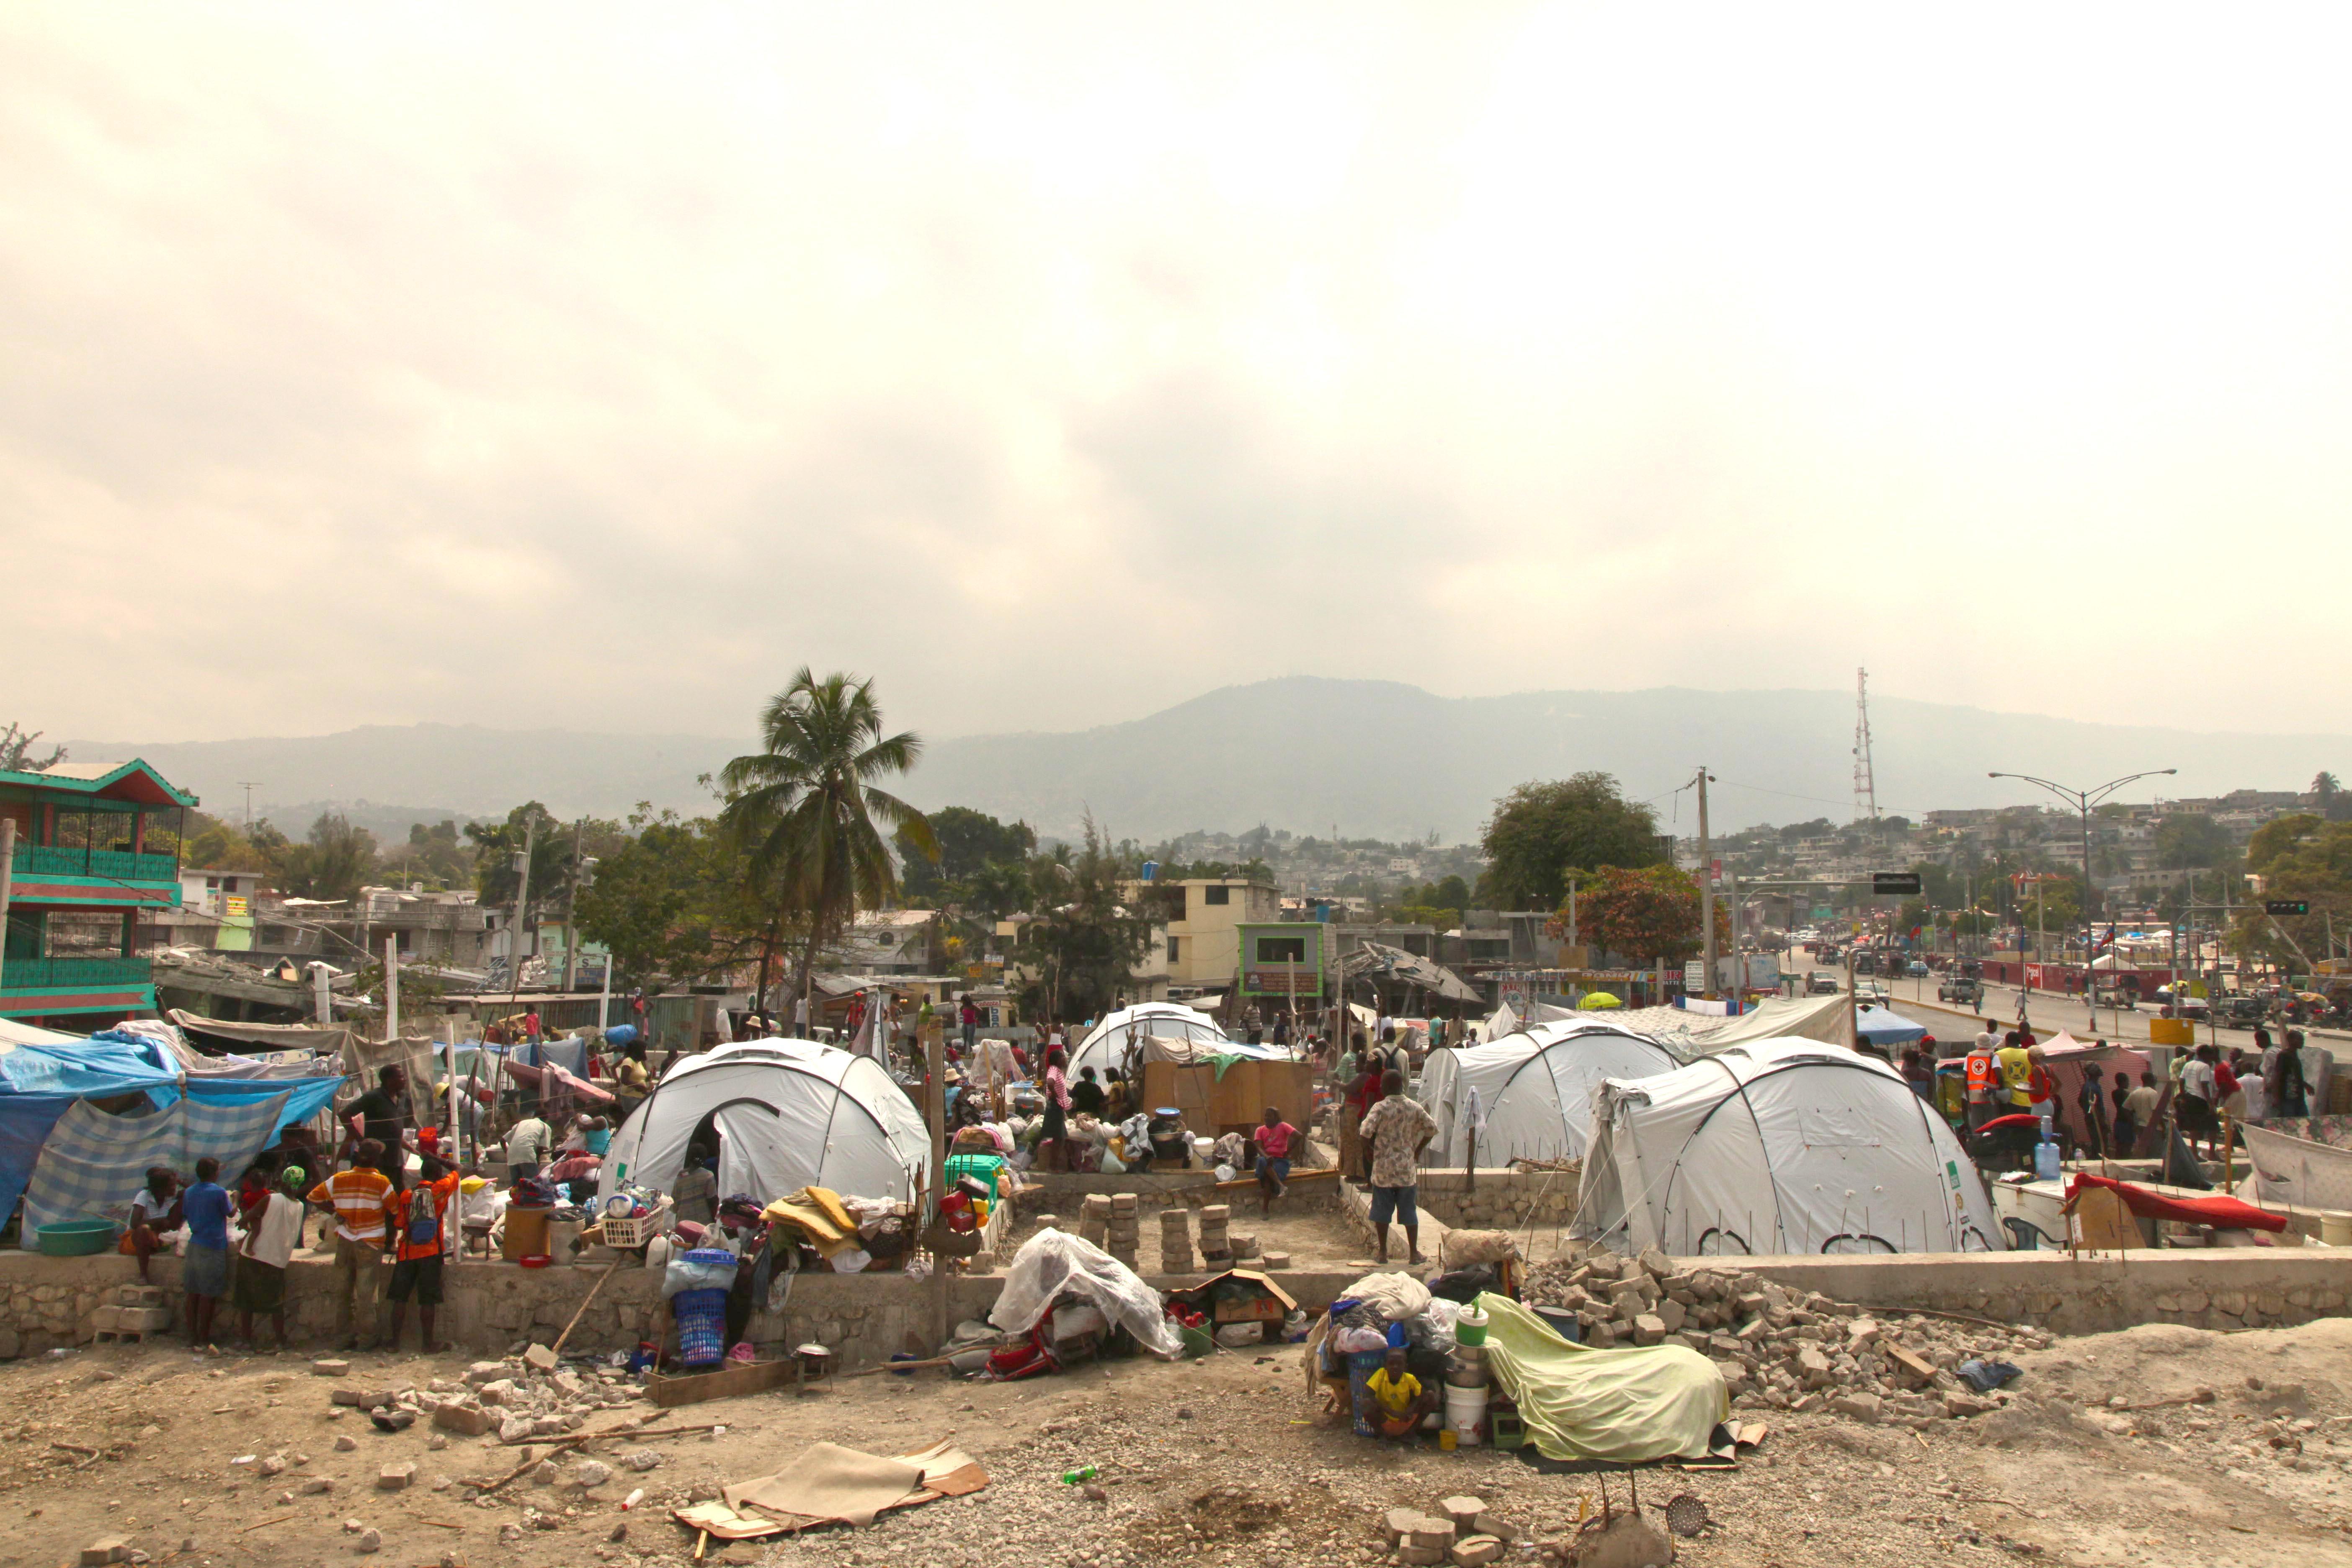 Tents After Haiti Earthquake